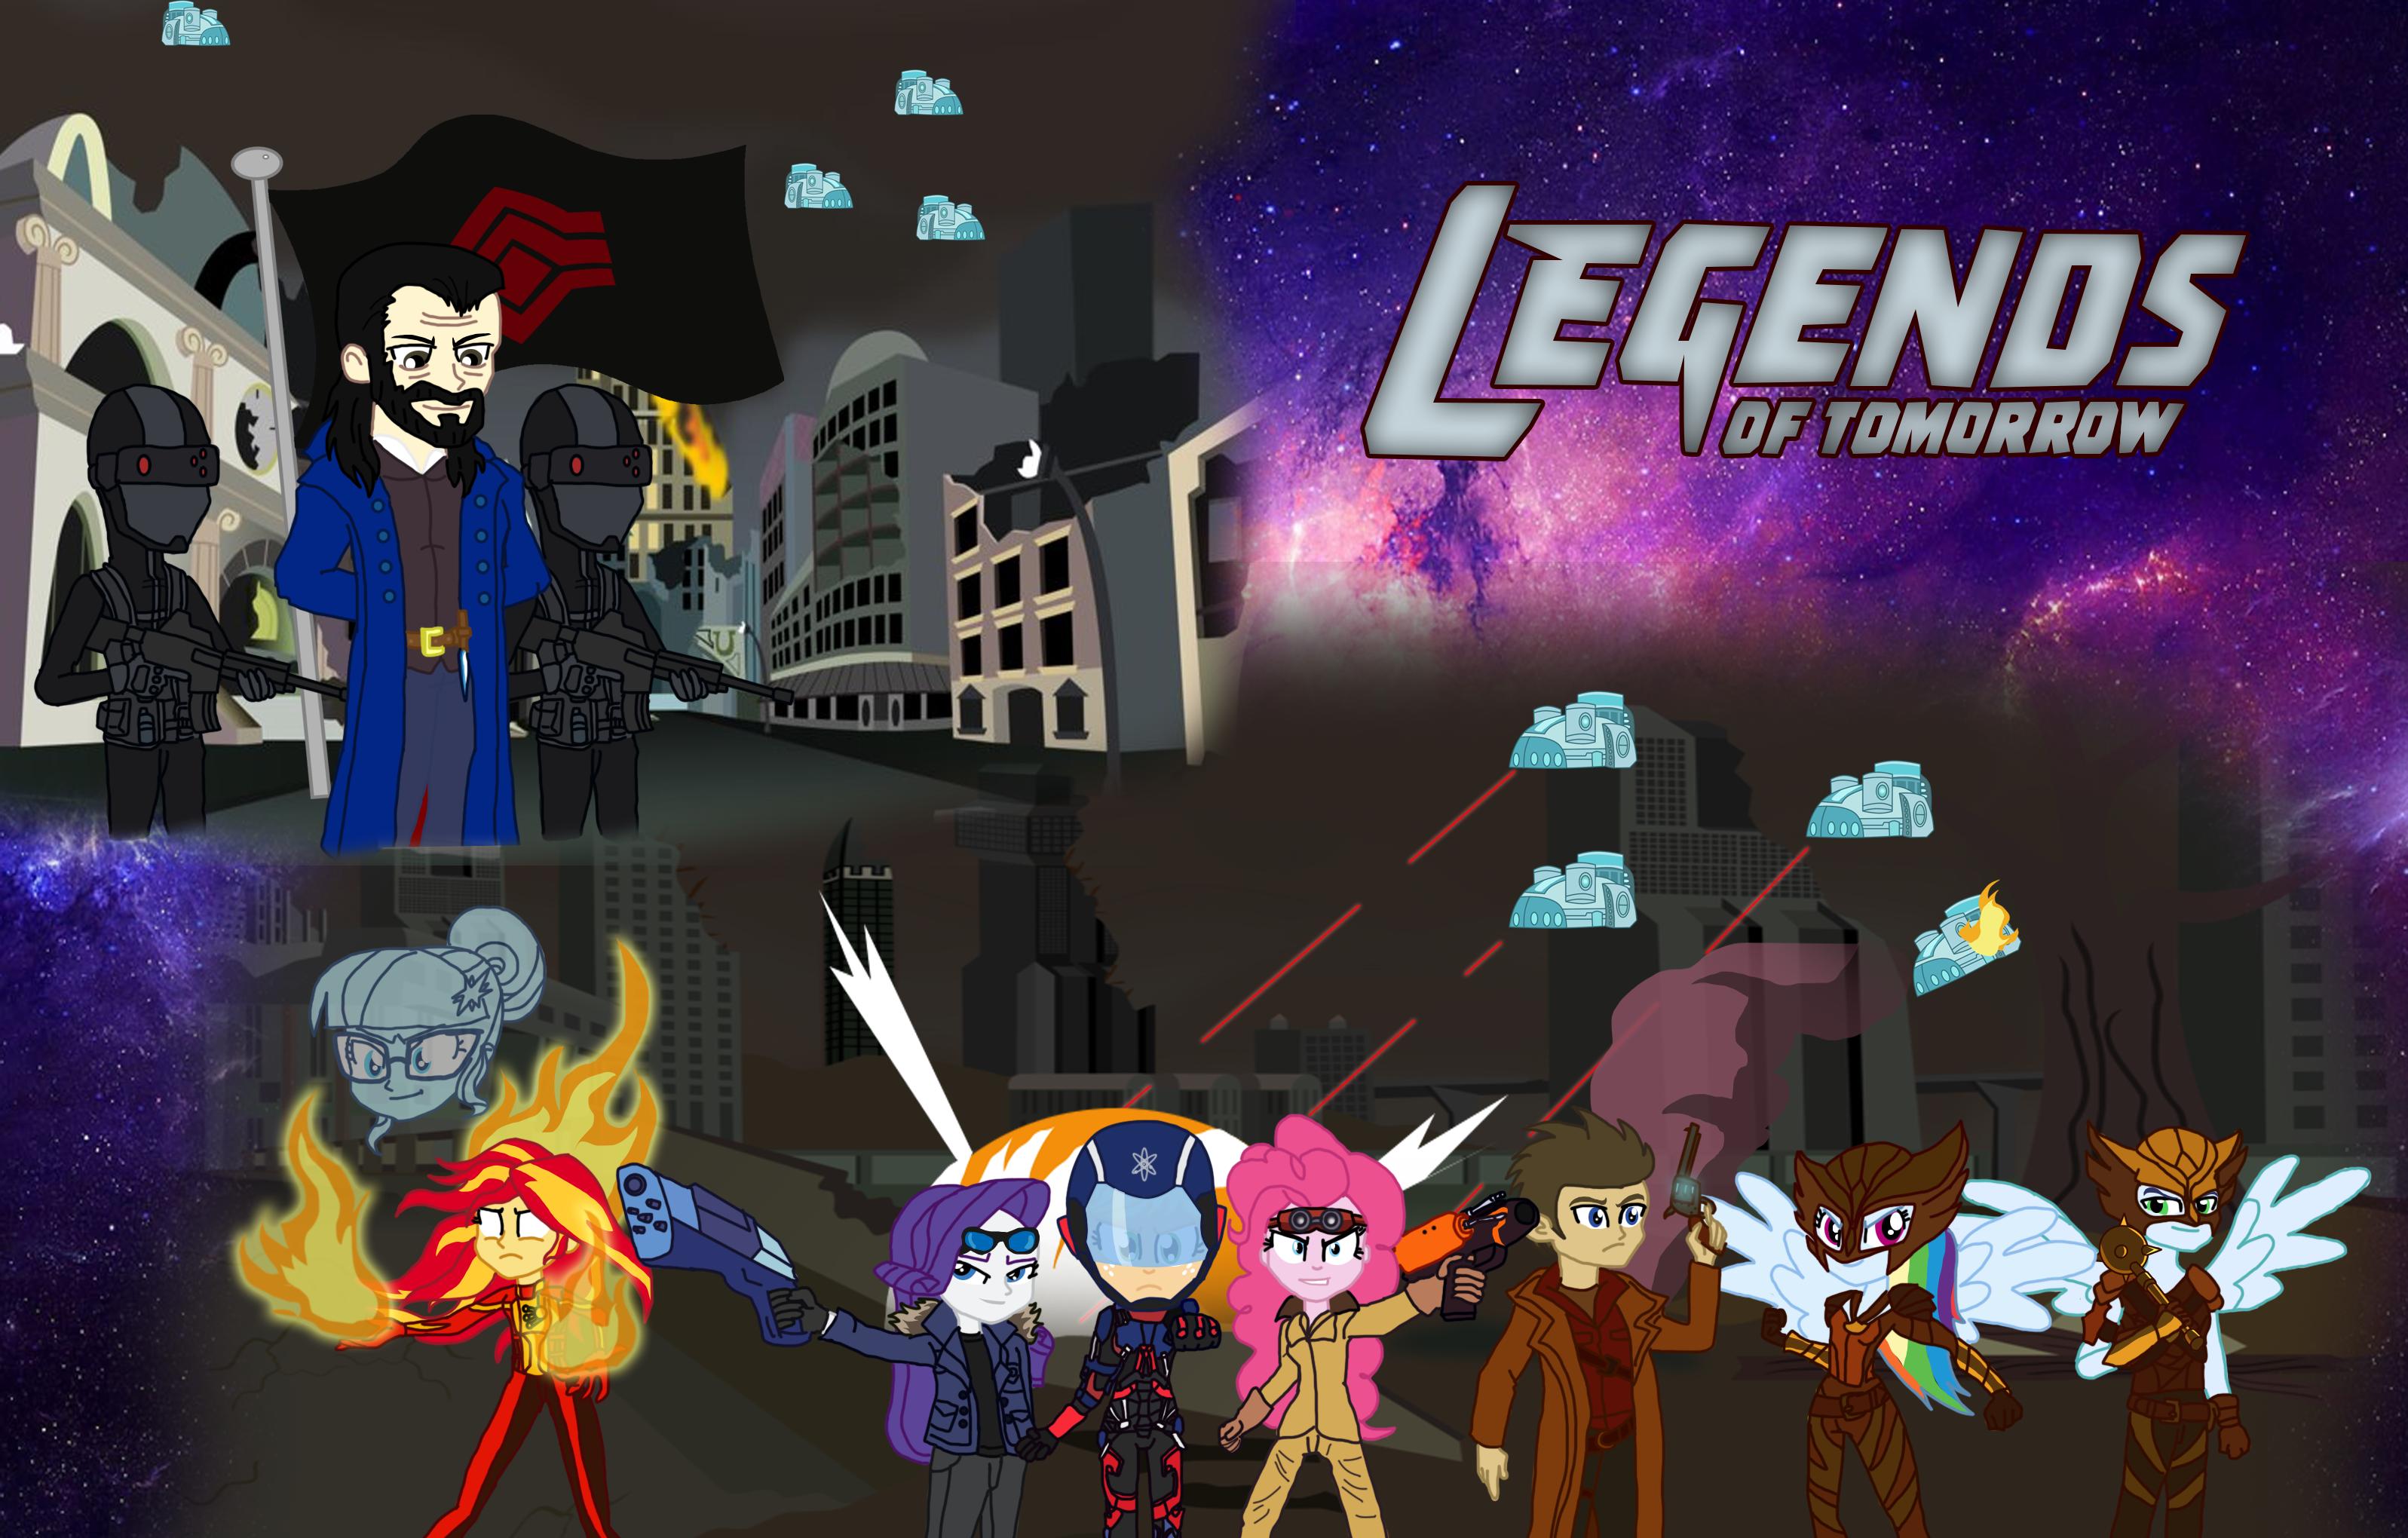 MLP EQG CROSSOVER Legends Of Tomorrow By Deidrax On DeviantArt